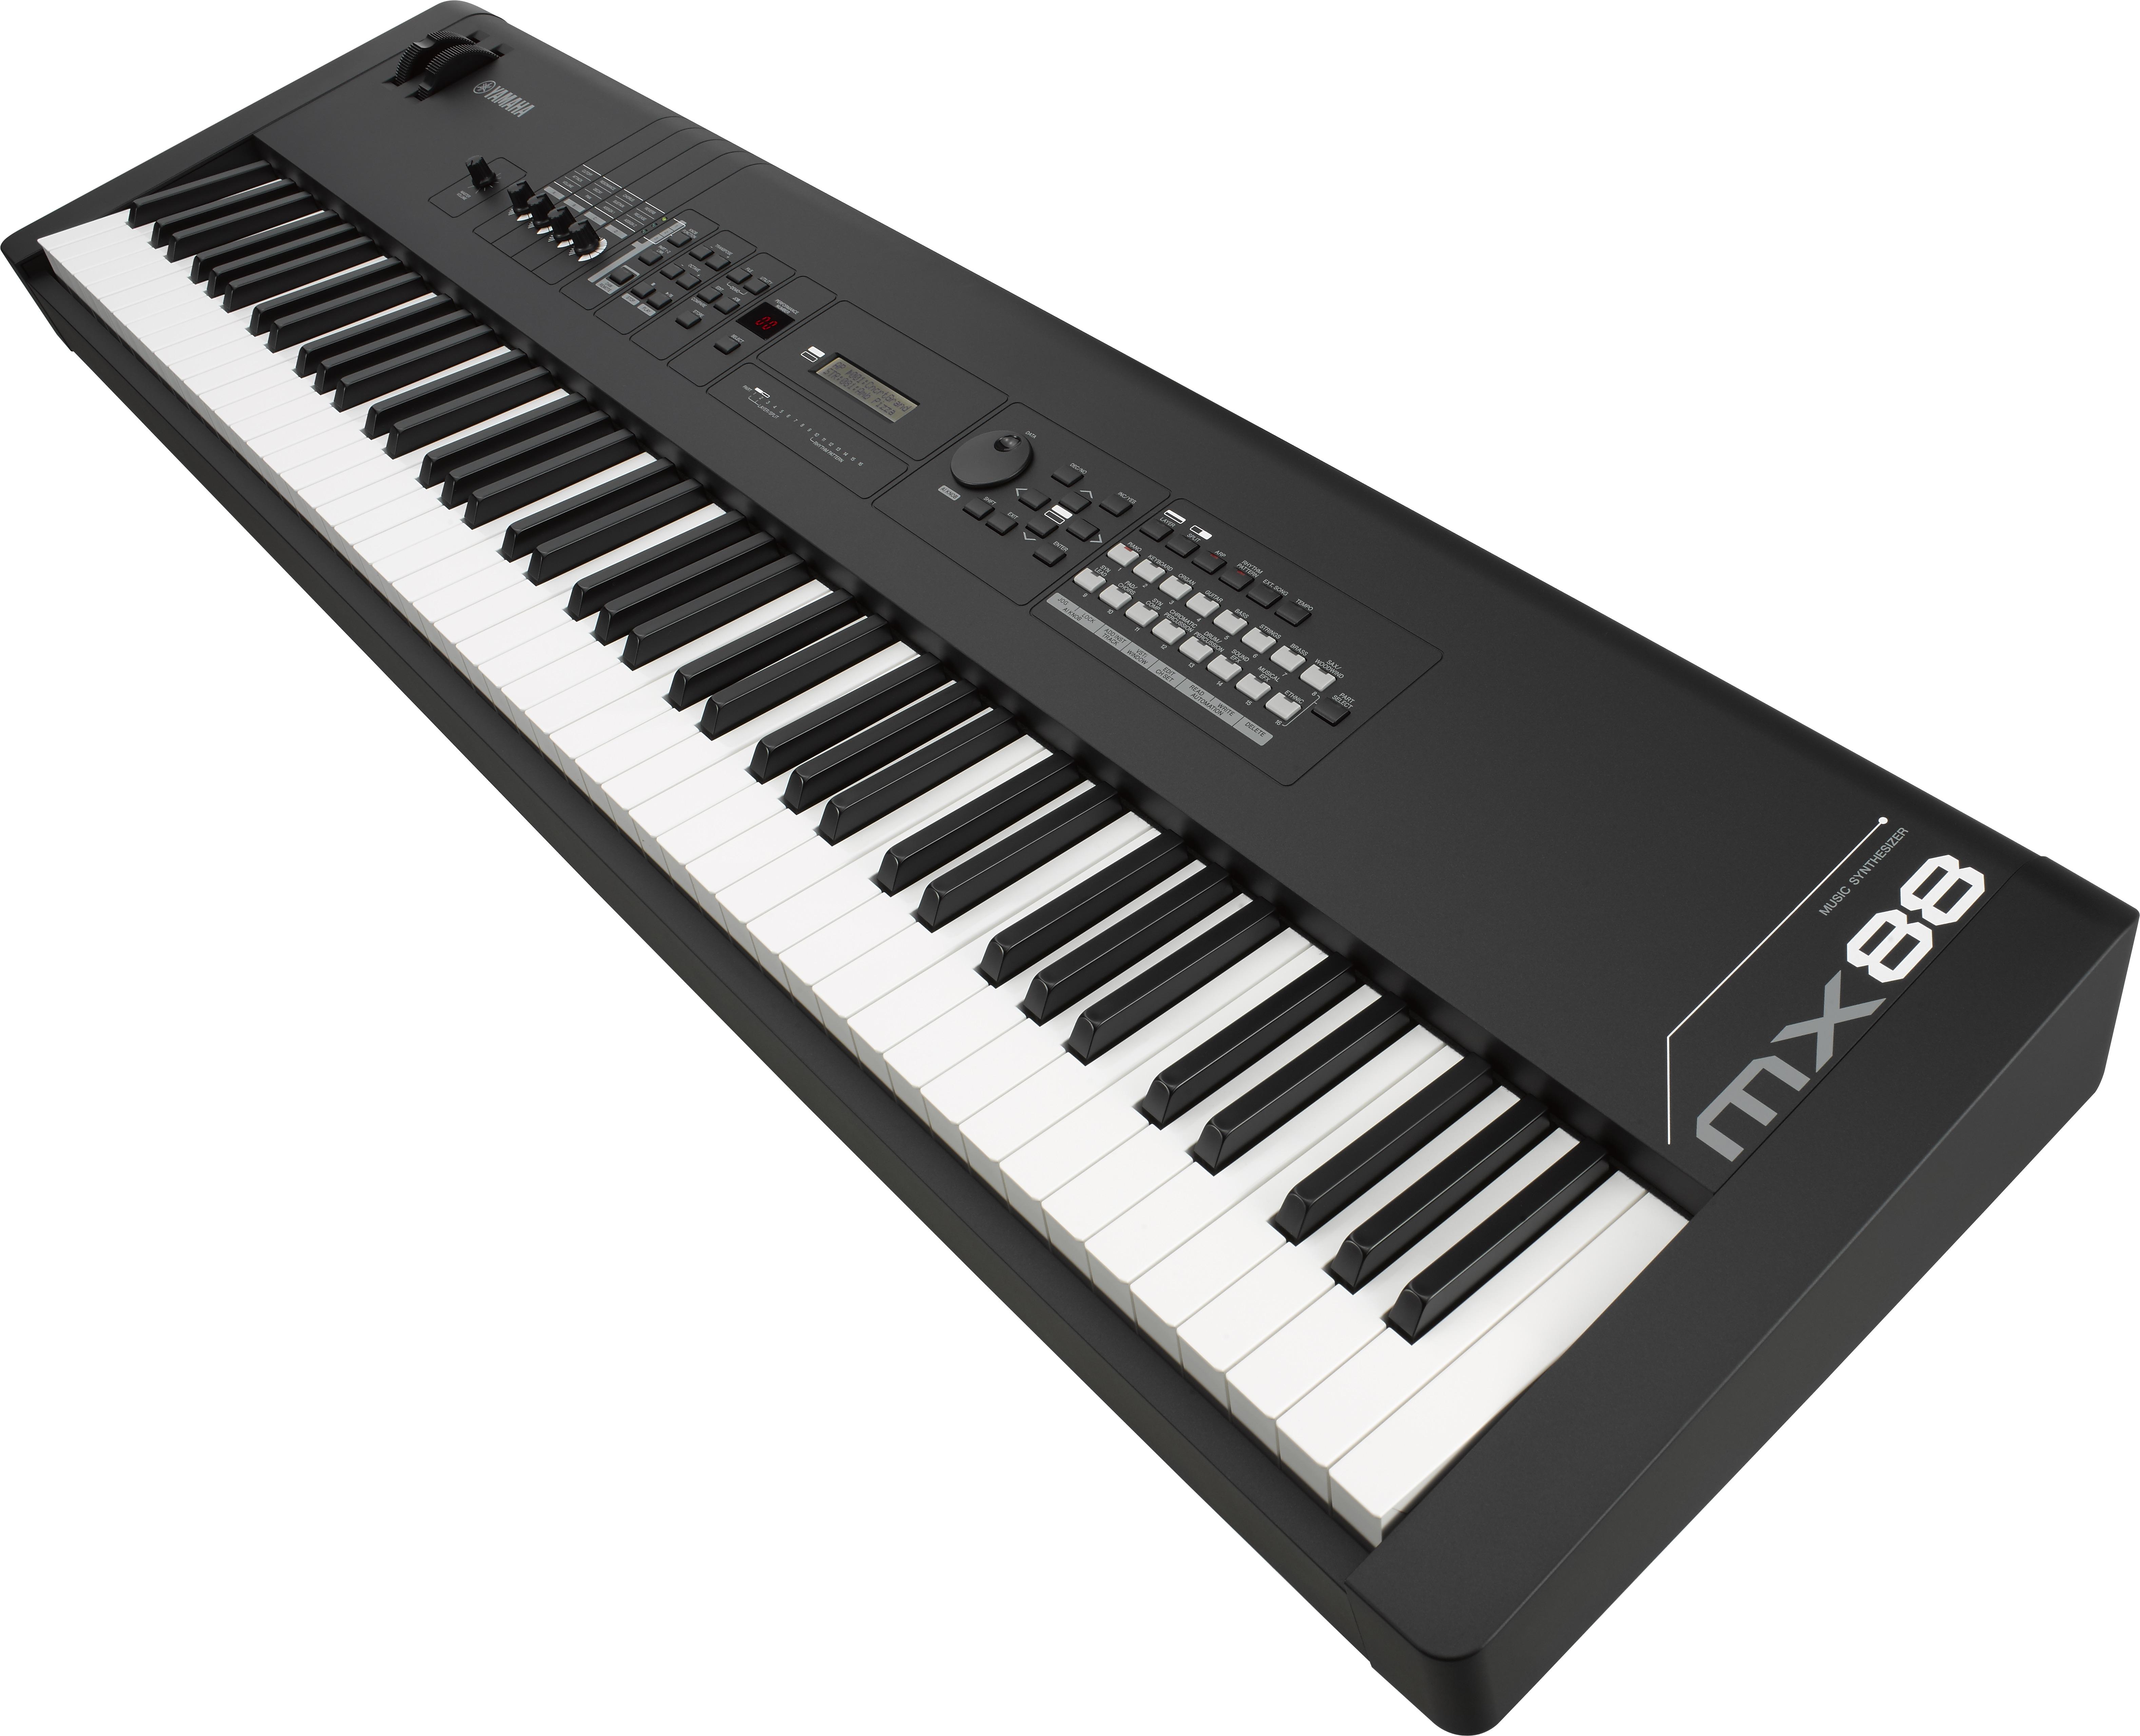 Image Result For Yamaha Keyboard Mx